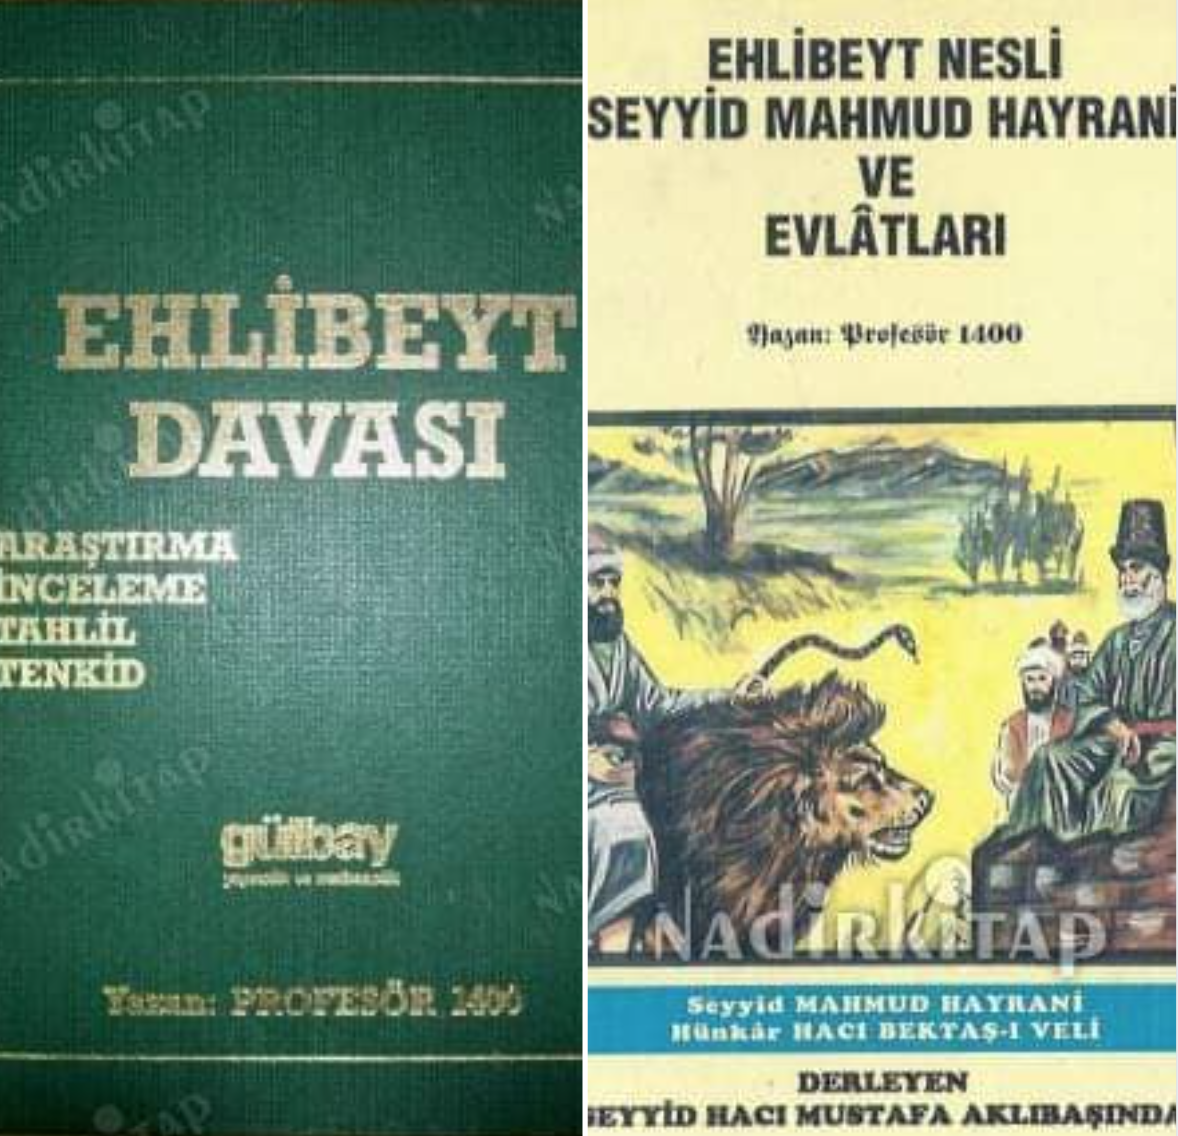 DAB Alevi bektaşi kızılbasi Pir Sultan Cem semah islami asimilasyon peof 1440 kim